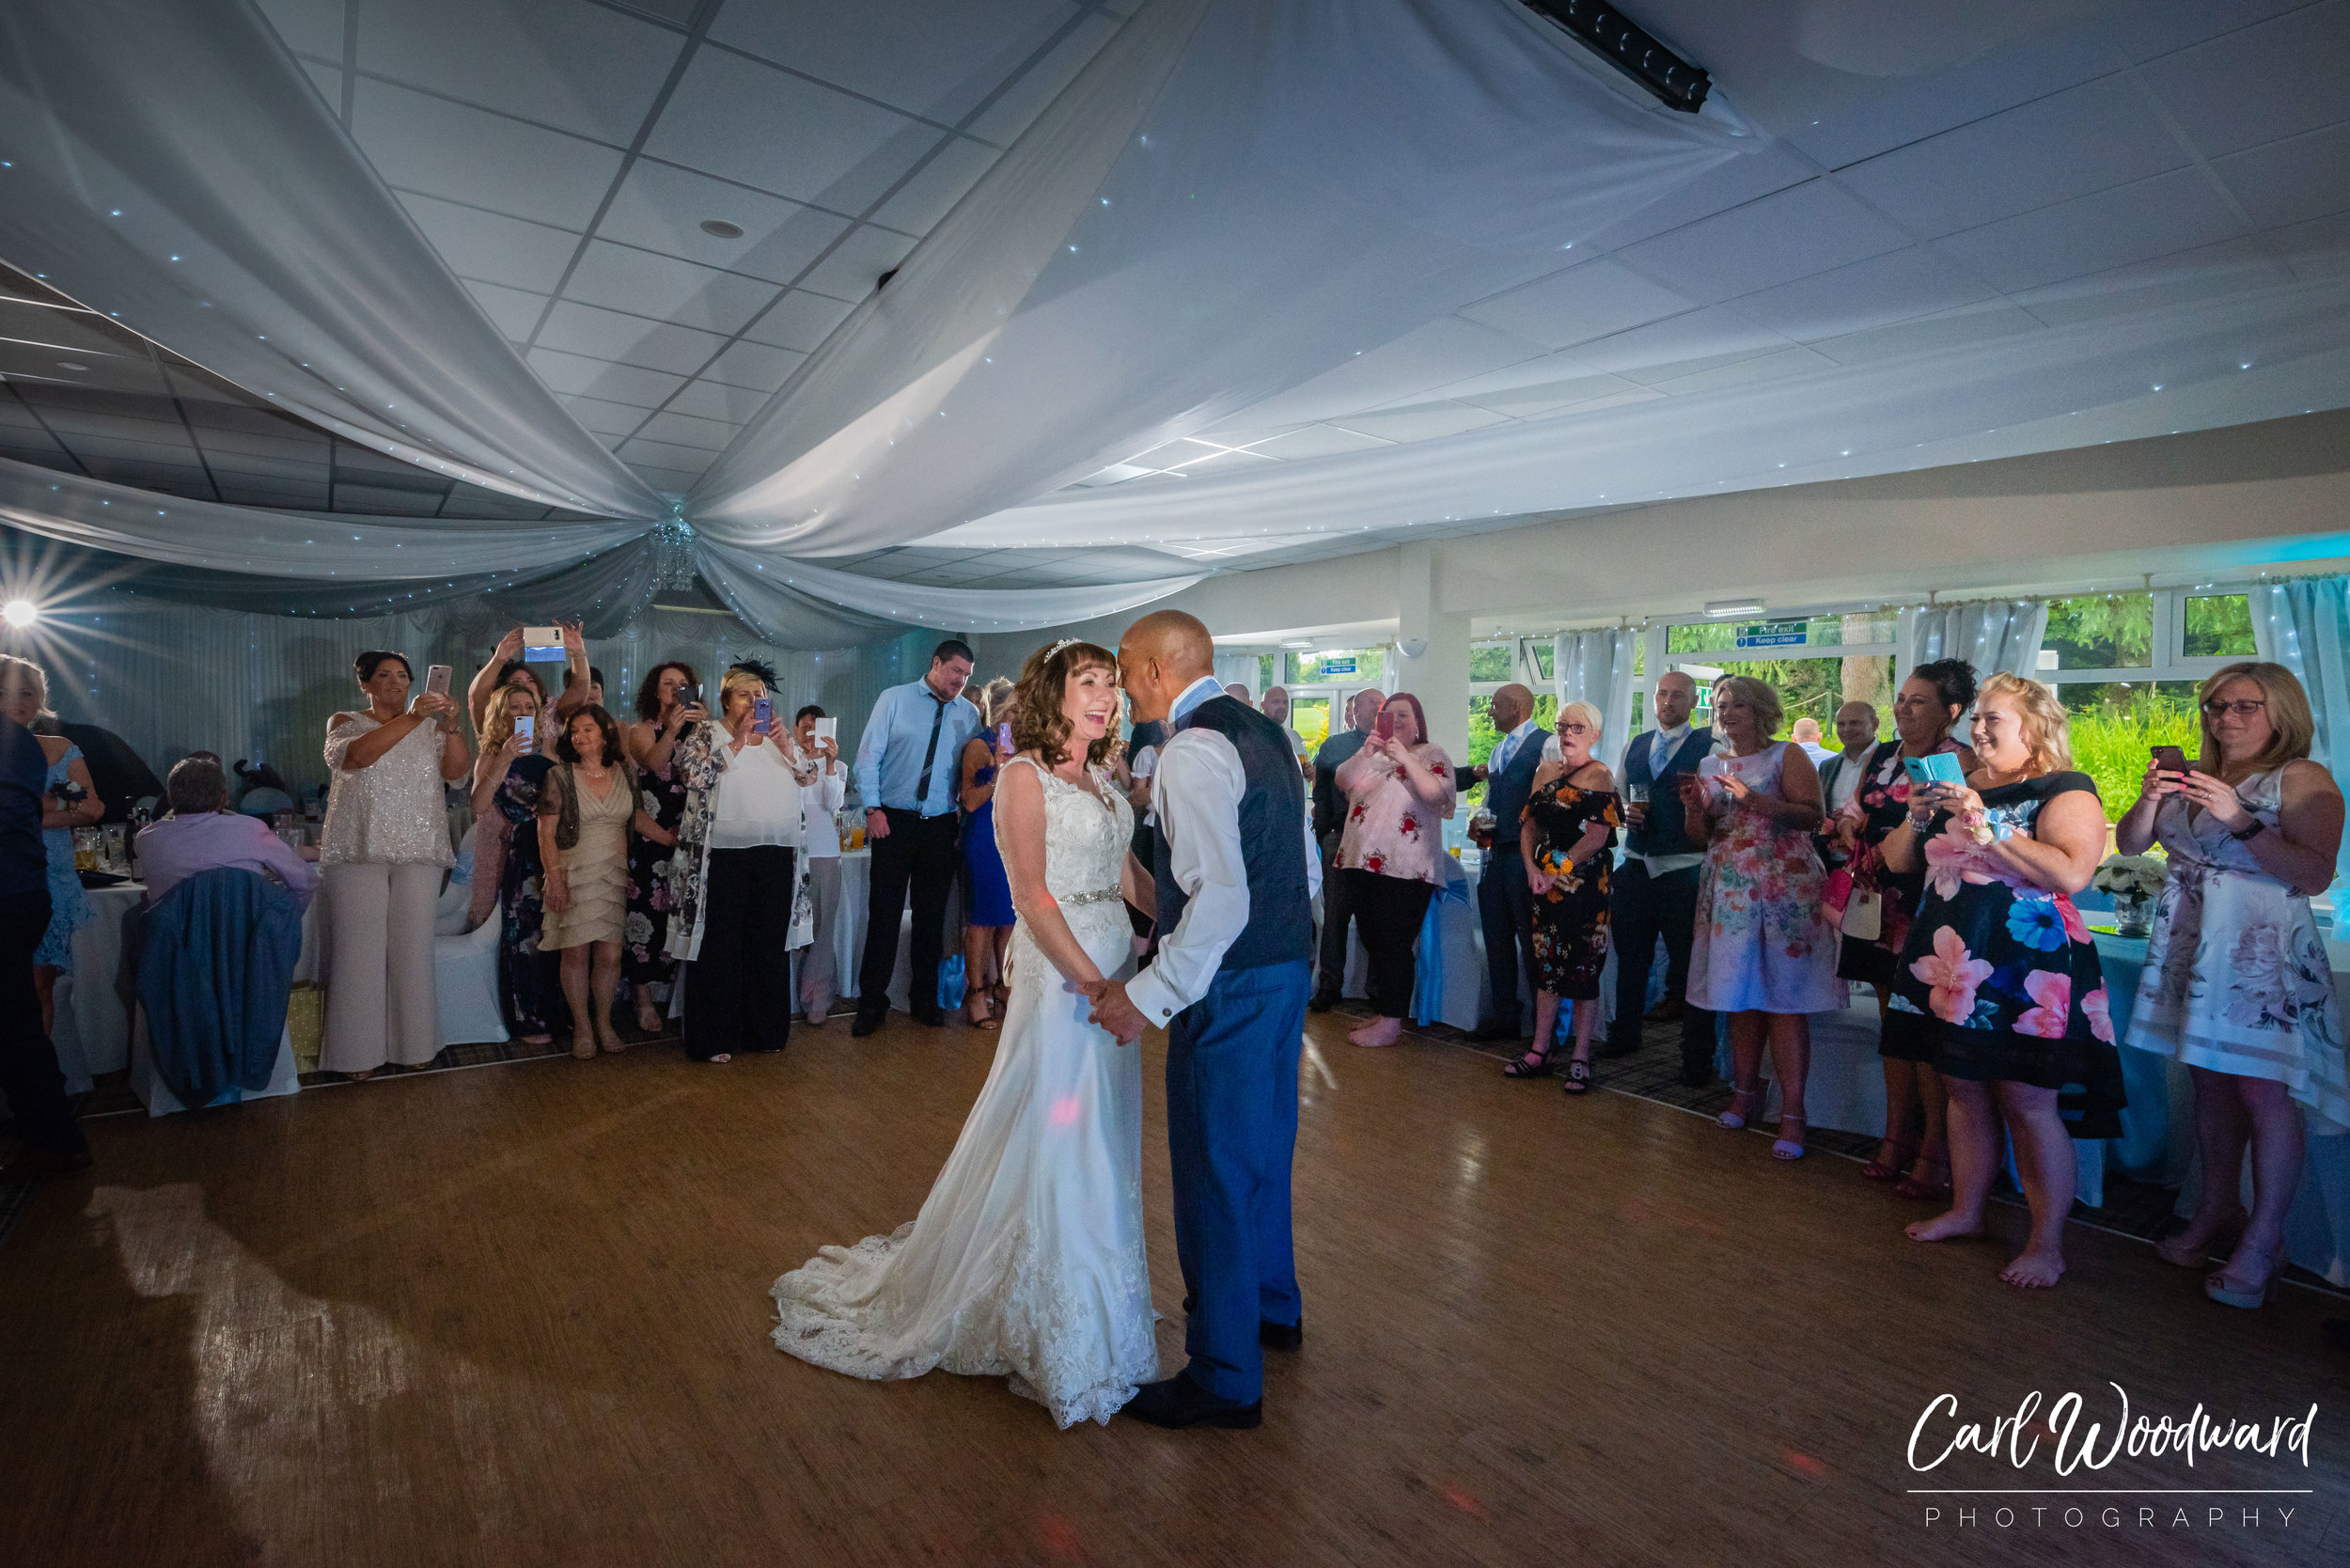 010-Mountain-Ash-Golf-Club-Wedding-Photography-Cardiff-Wedding-Photographer.jpg